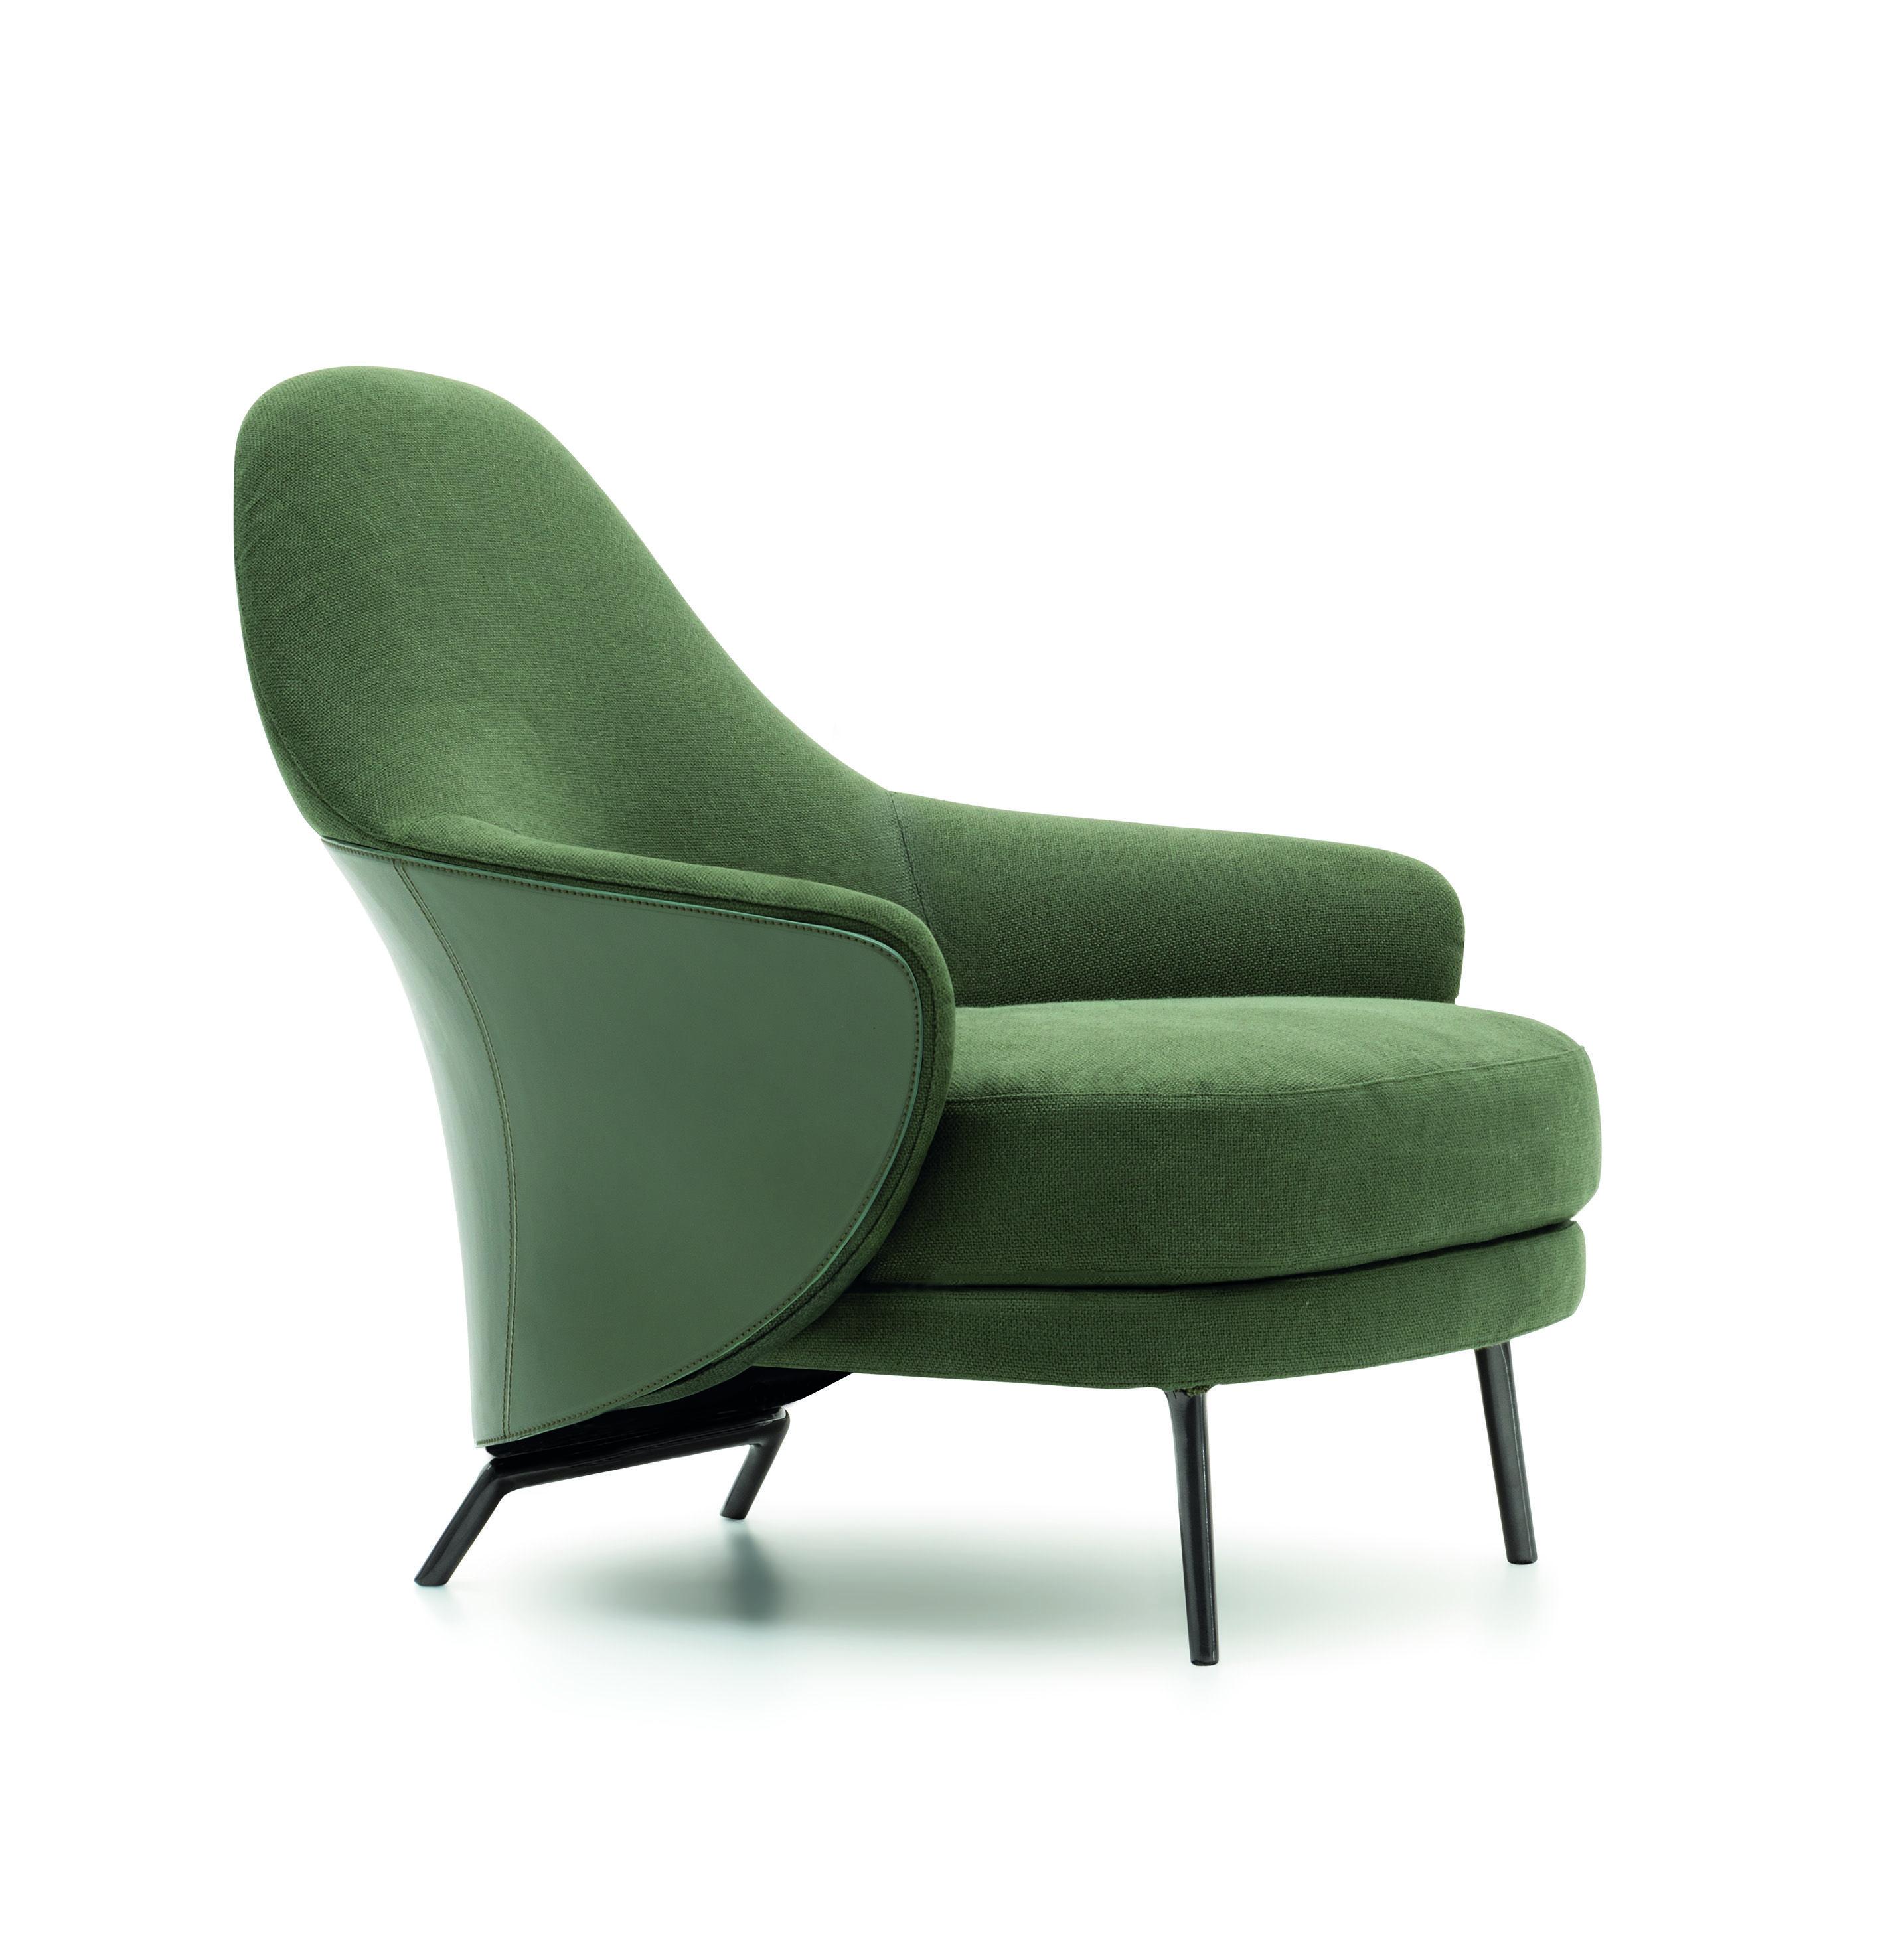 Angie Armchair By Minotti Design Gamfratesi Design Armchair Design Sofa Chair Carved Wooden Sofa